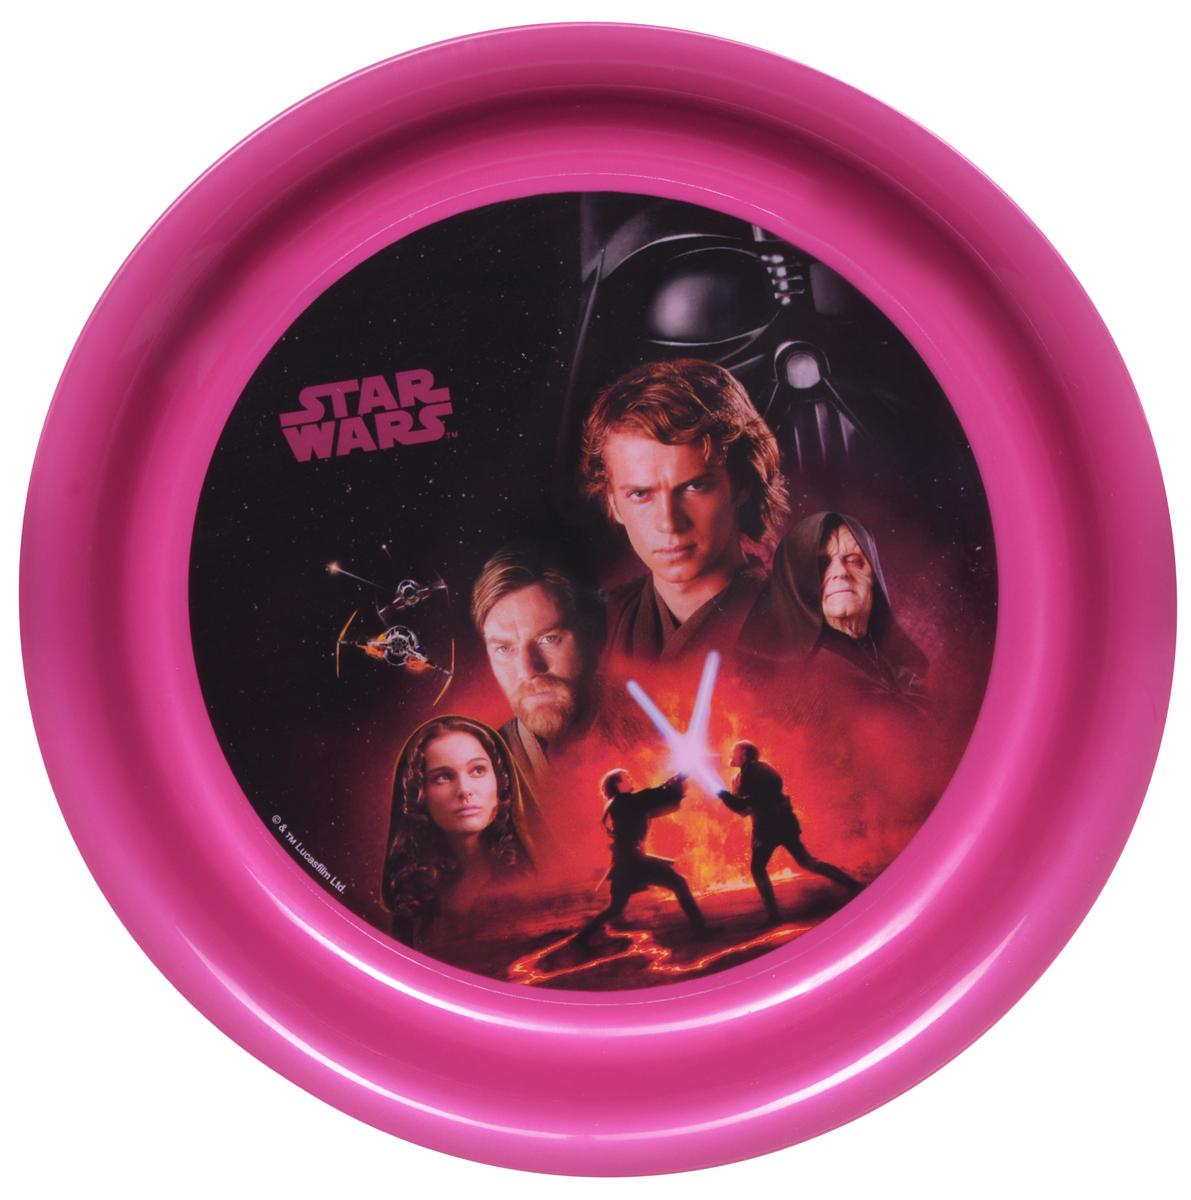 Фото - Star Wars Тарелка детская диаметр 19 см star wars тарелка детская штурмовики диаметр 19 см